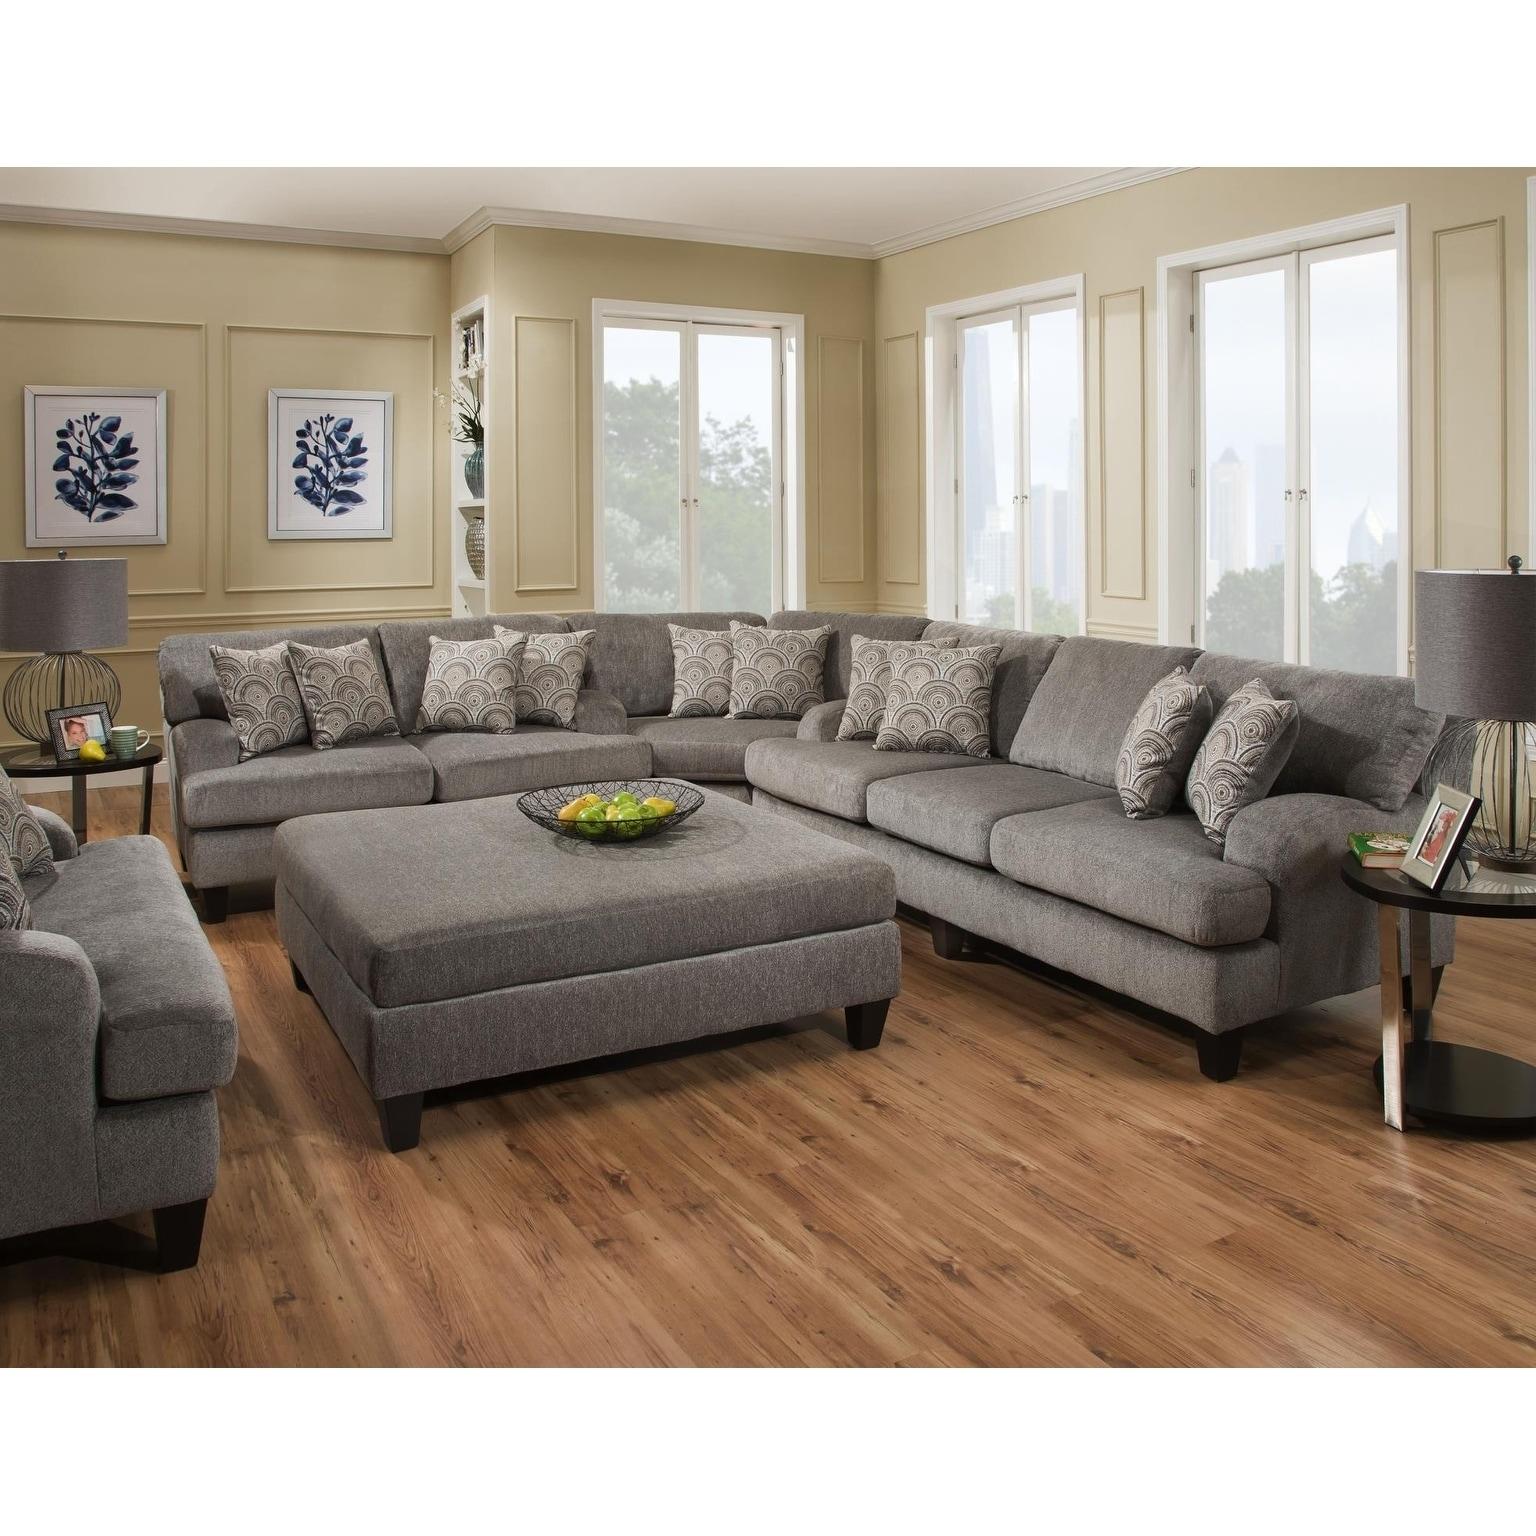 Fantastic Sofatrendz Douglass Grey Sectional Creativecarmelina Interior Chair Design Creativecarmelinacom